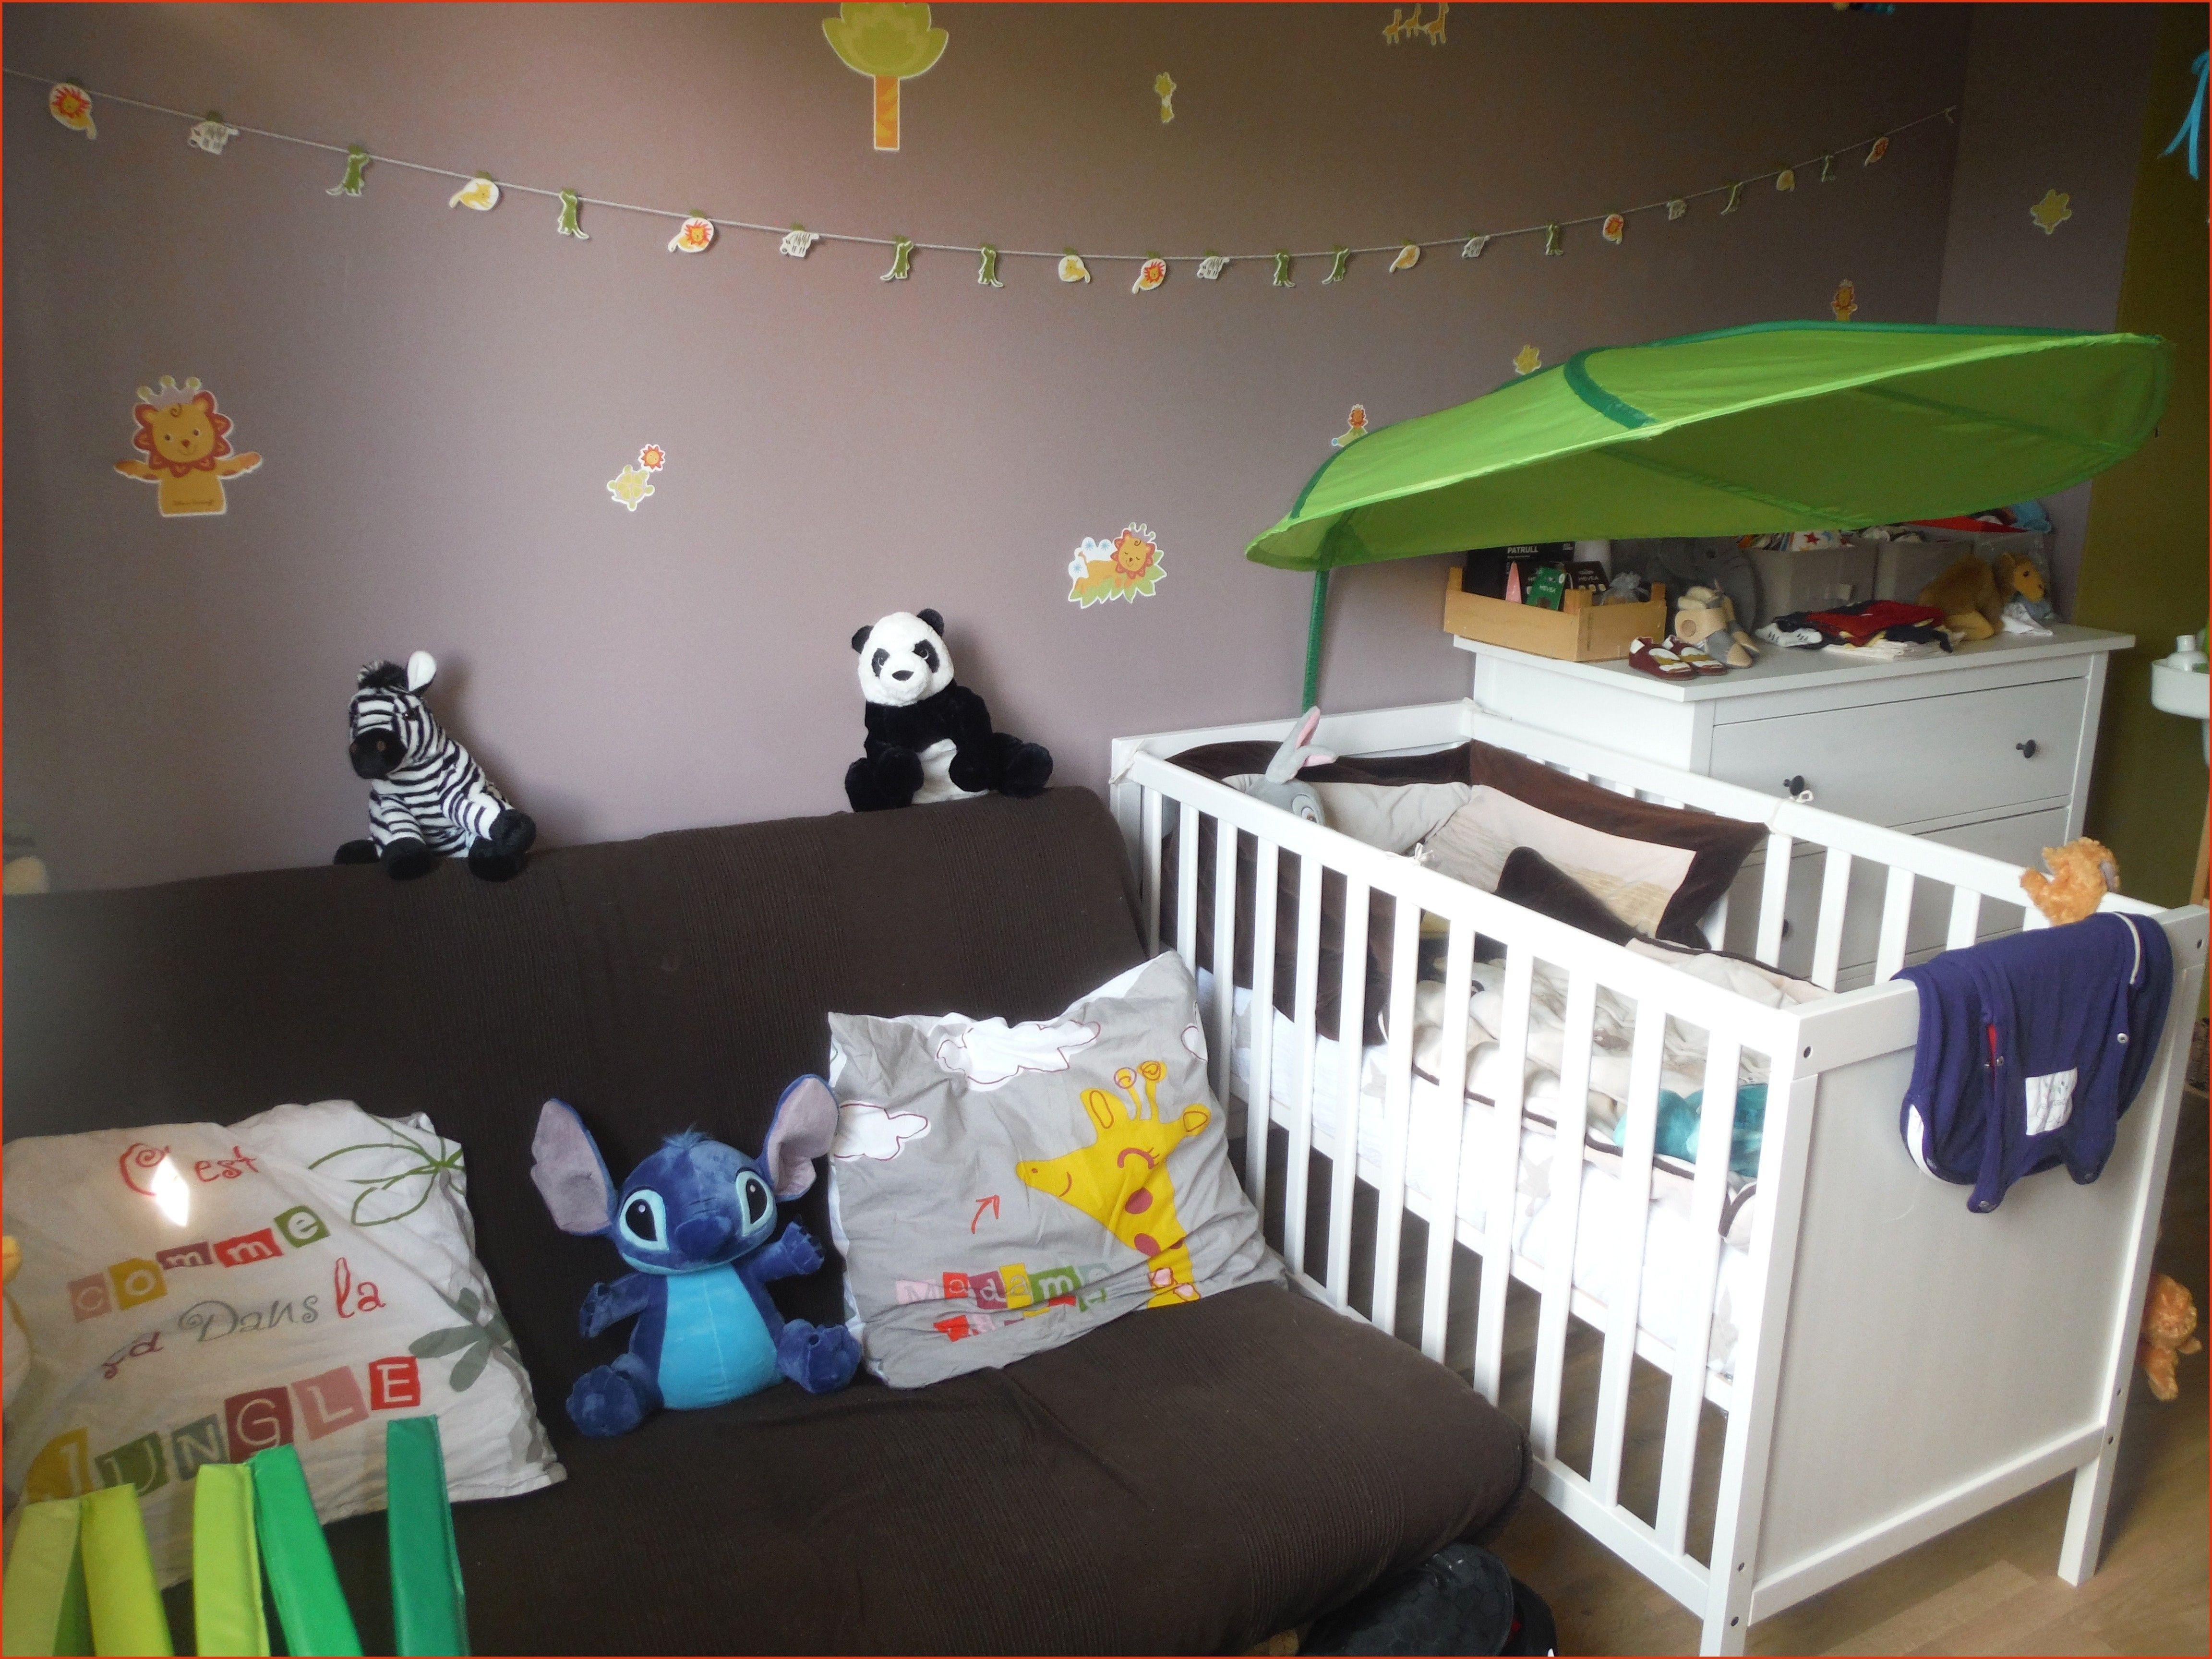 Baignoire Bebe Sur Pied Ikea Nous Aimons Toddler Bed Bed Home Decor